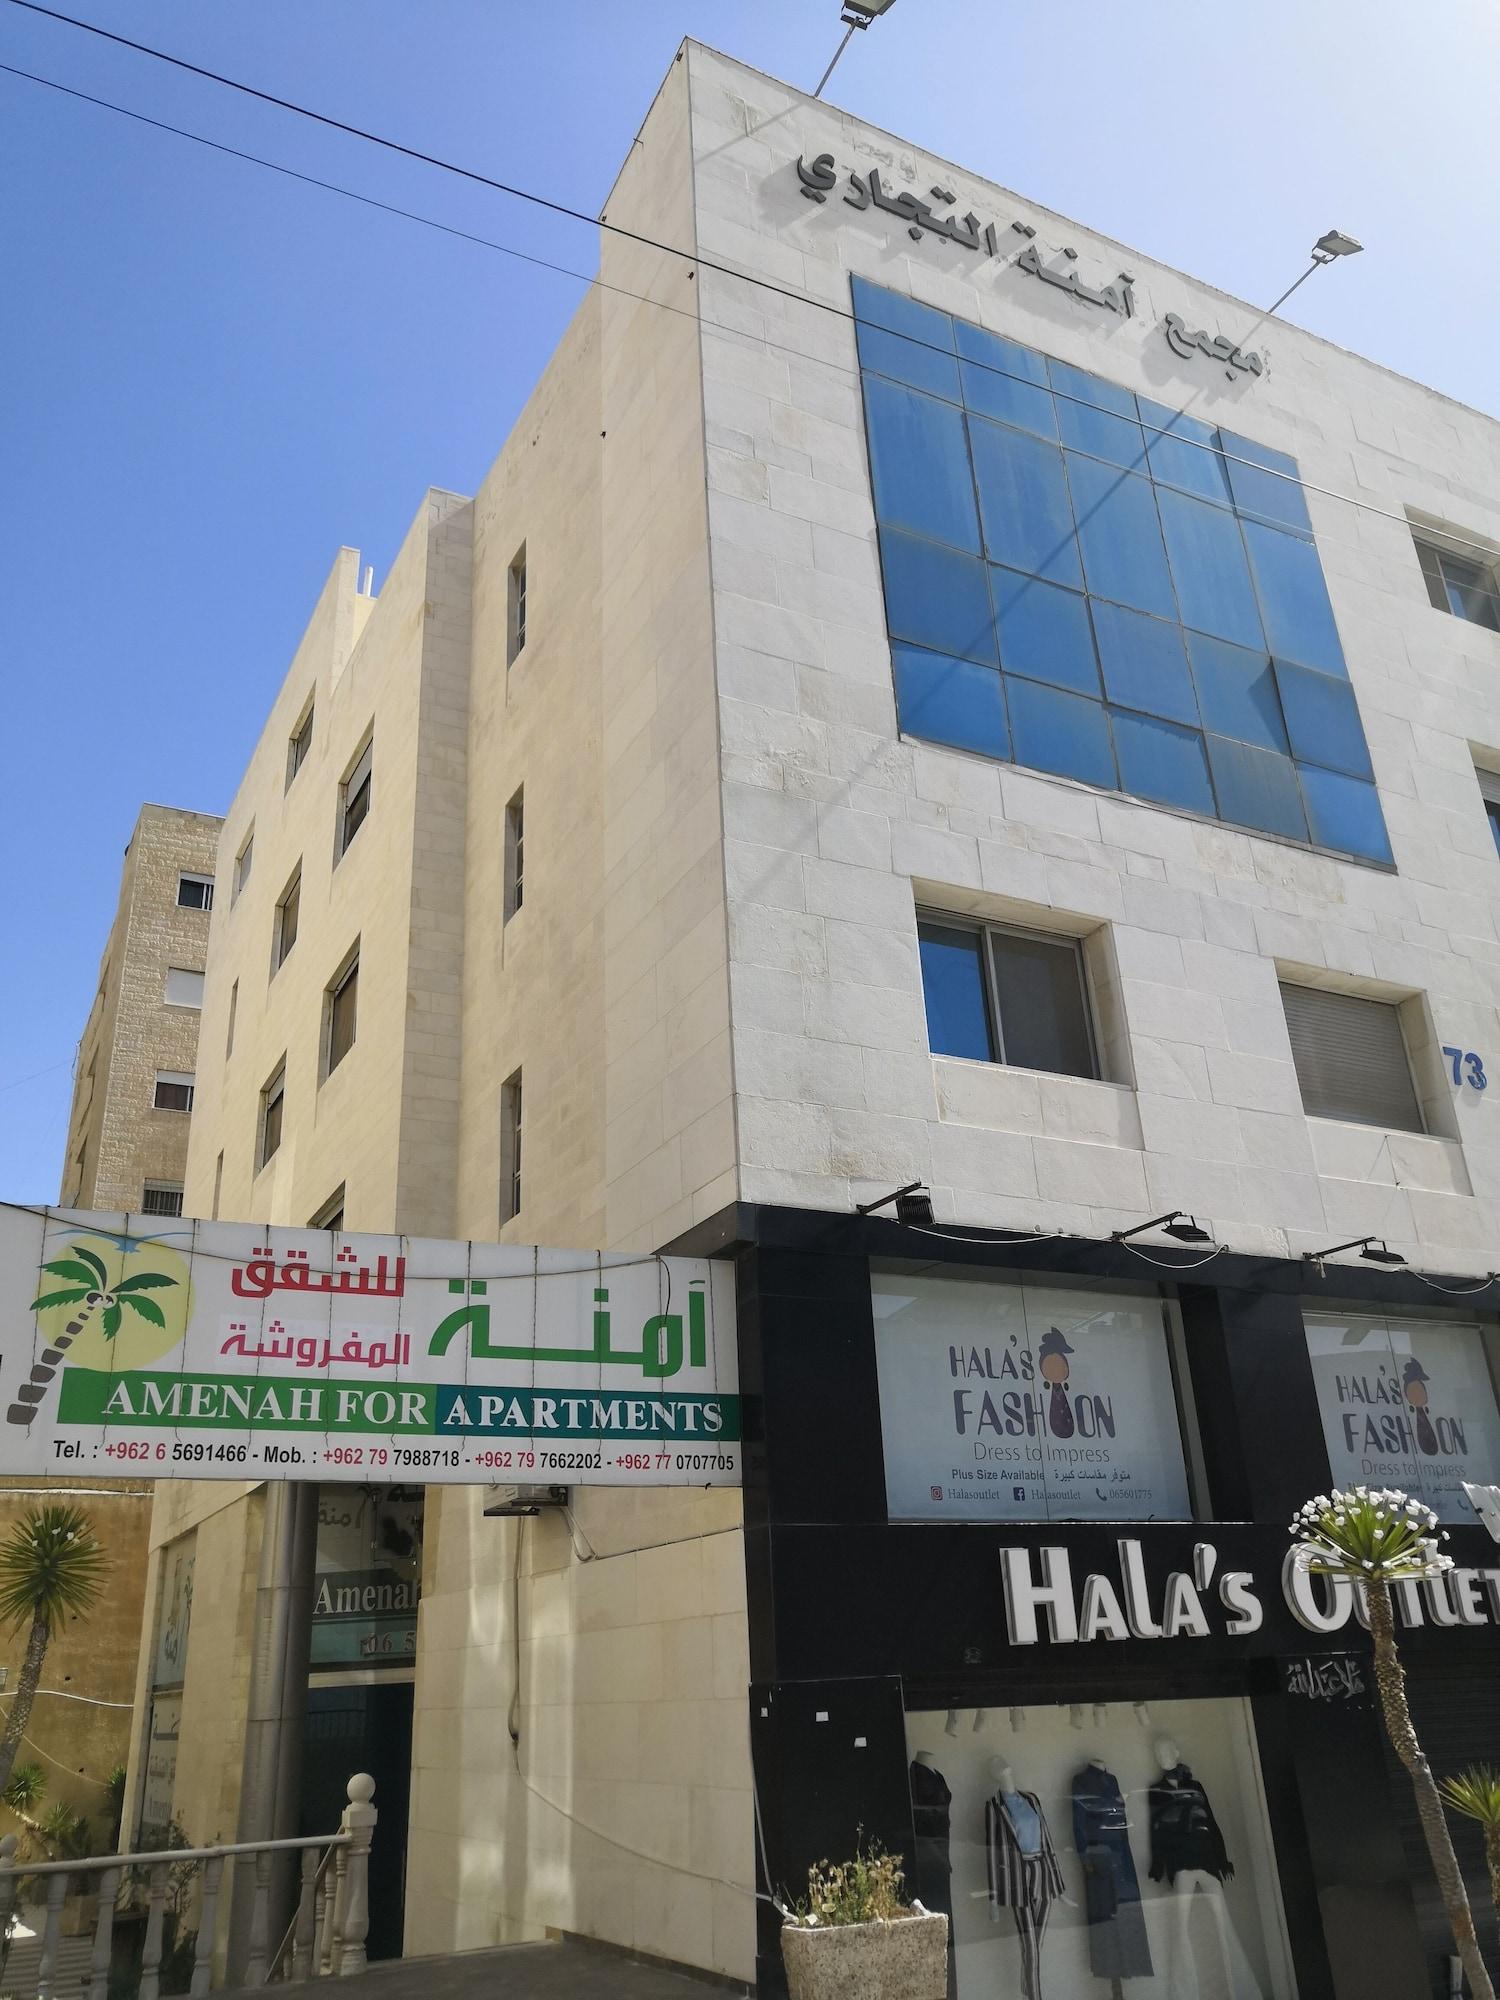 Amnah Apartments, Salt